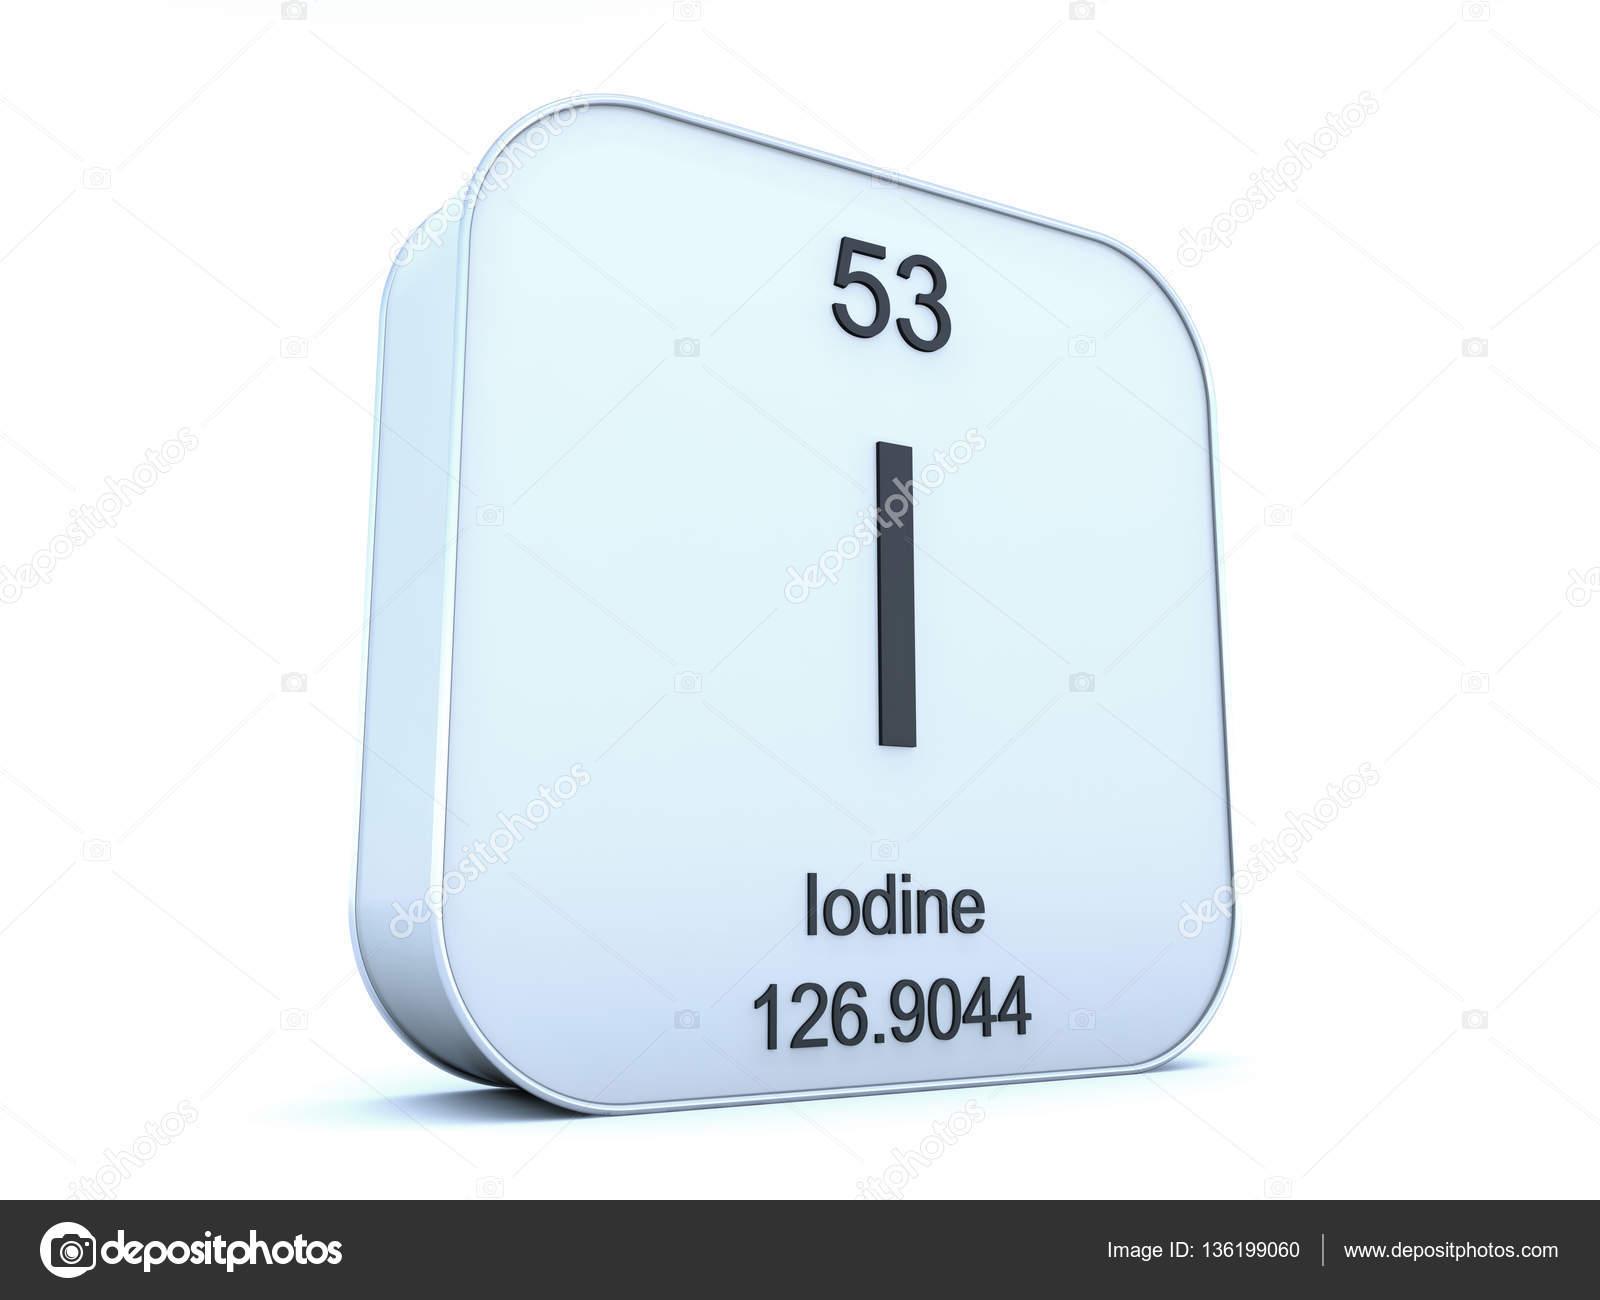 Iodine element on white square icon stock photo conceptw 136199060 iodine element symbol from the periodic table on white rounded square icon photo by conceptw urtaz Choice Image